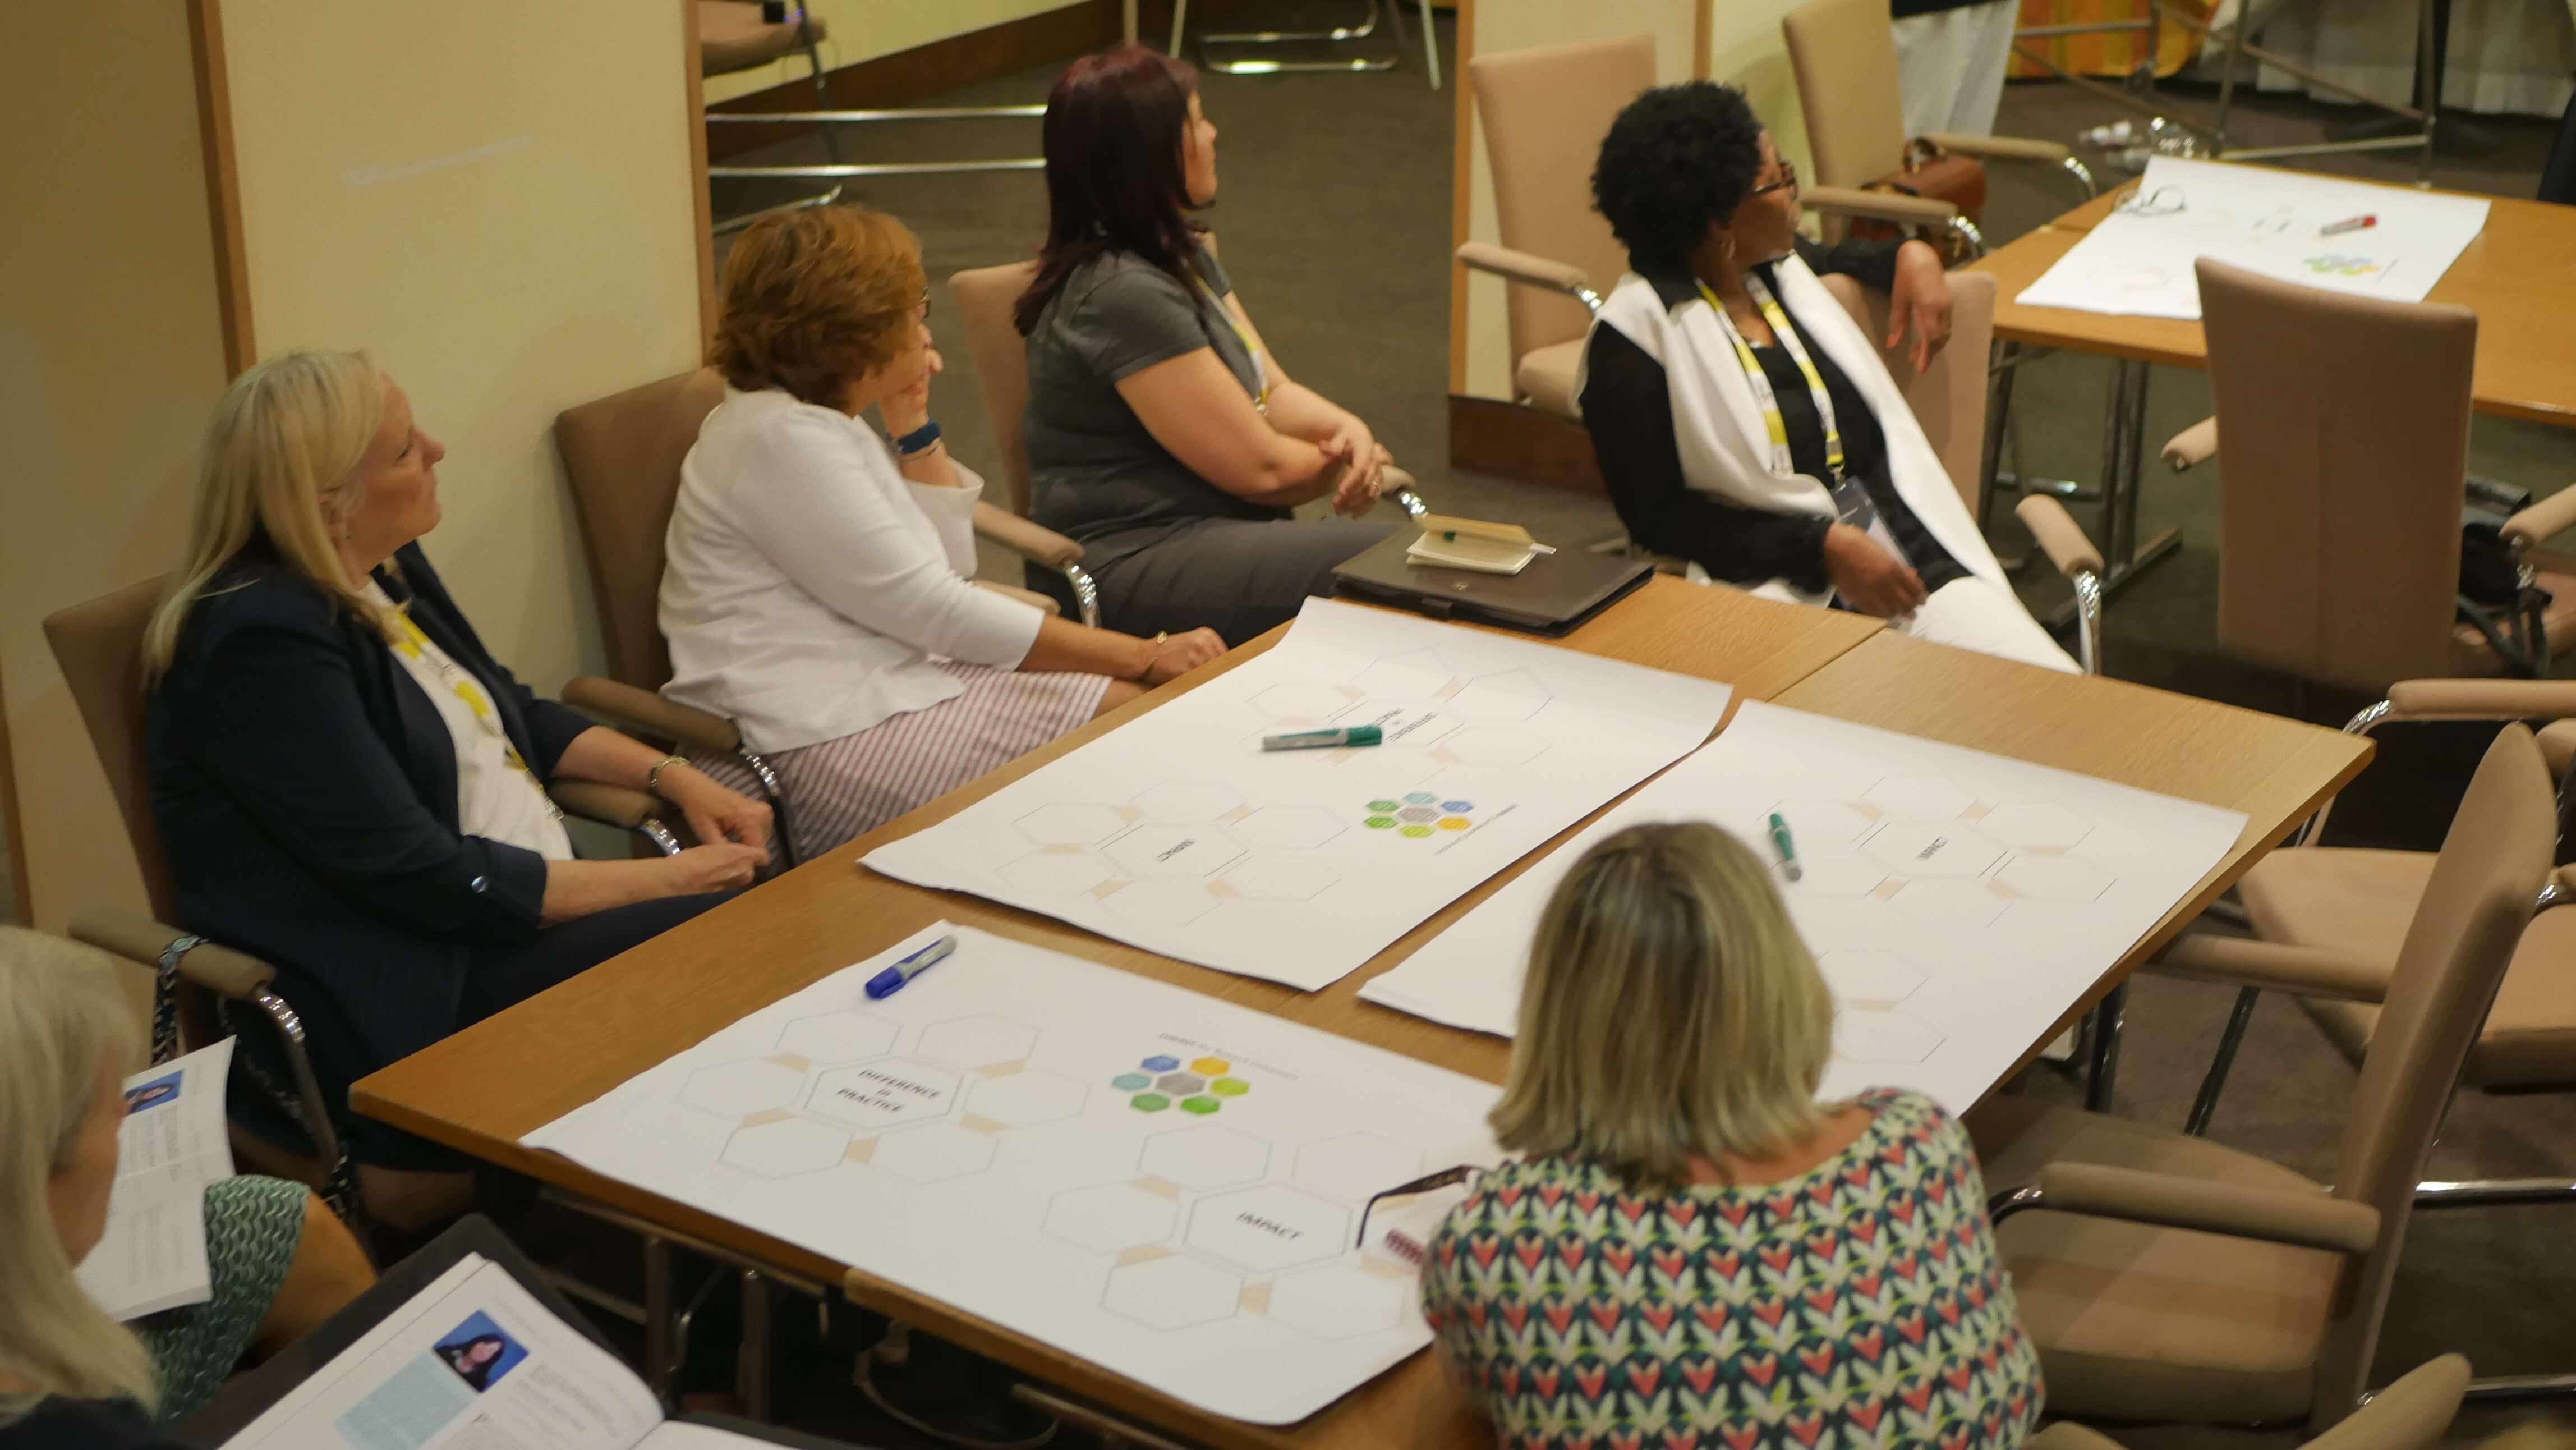 Nursing 2018 conference gallery